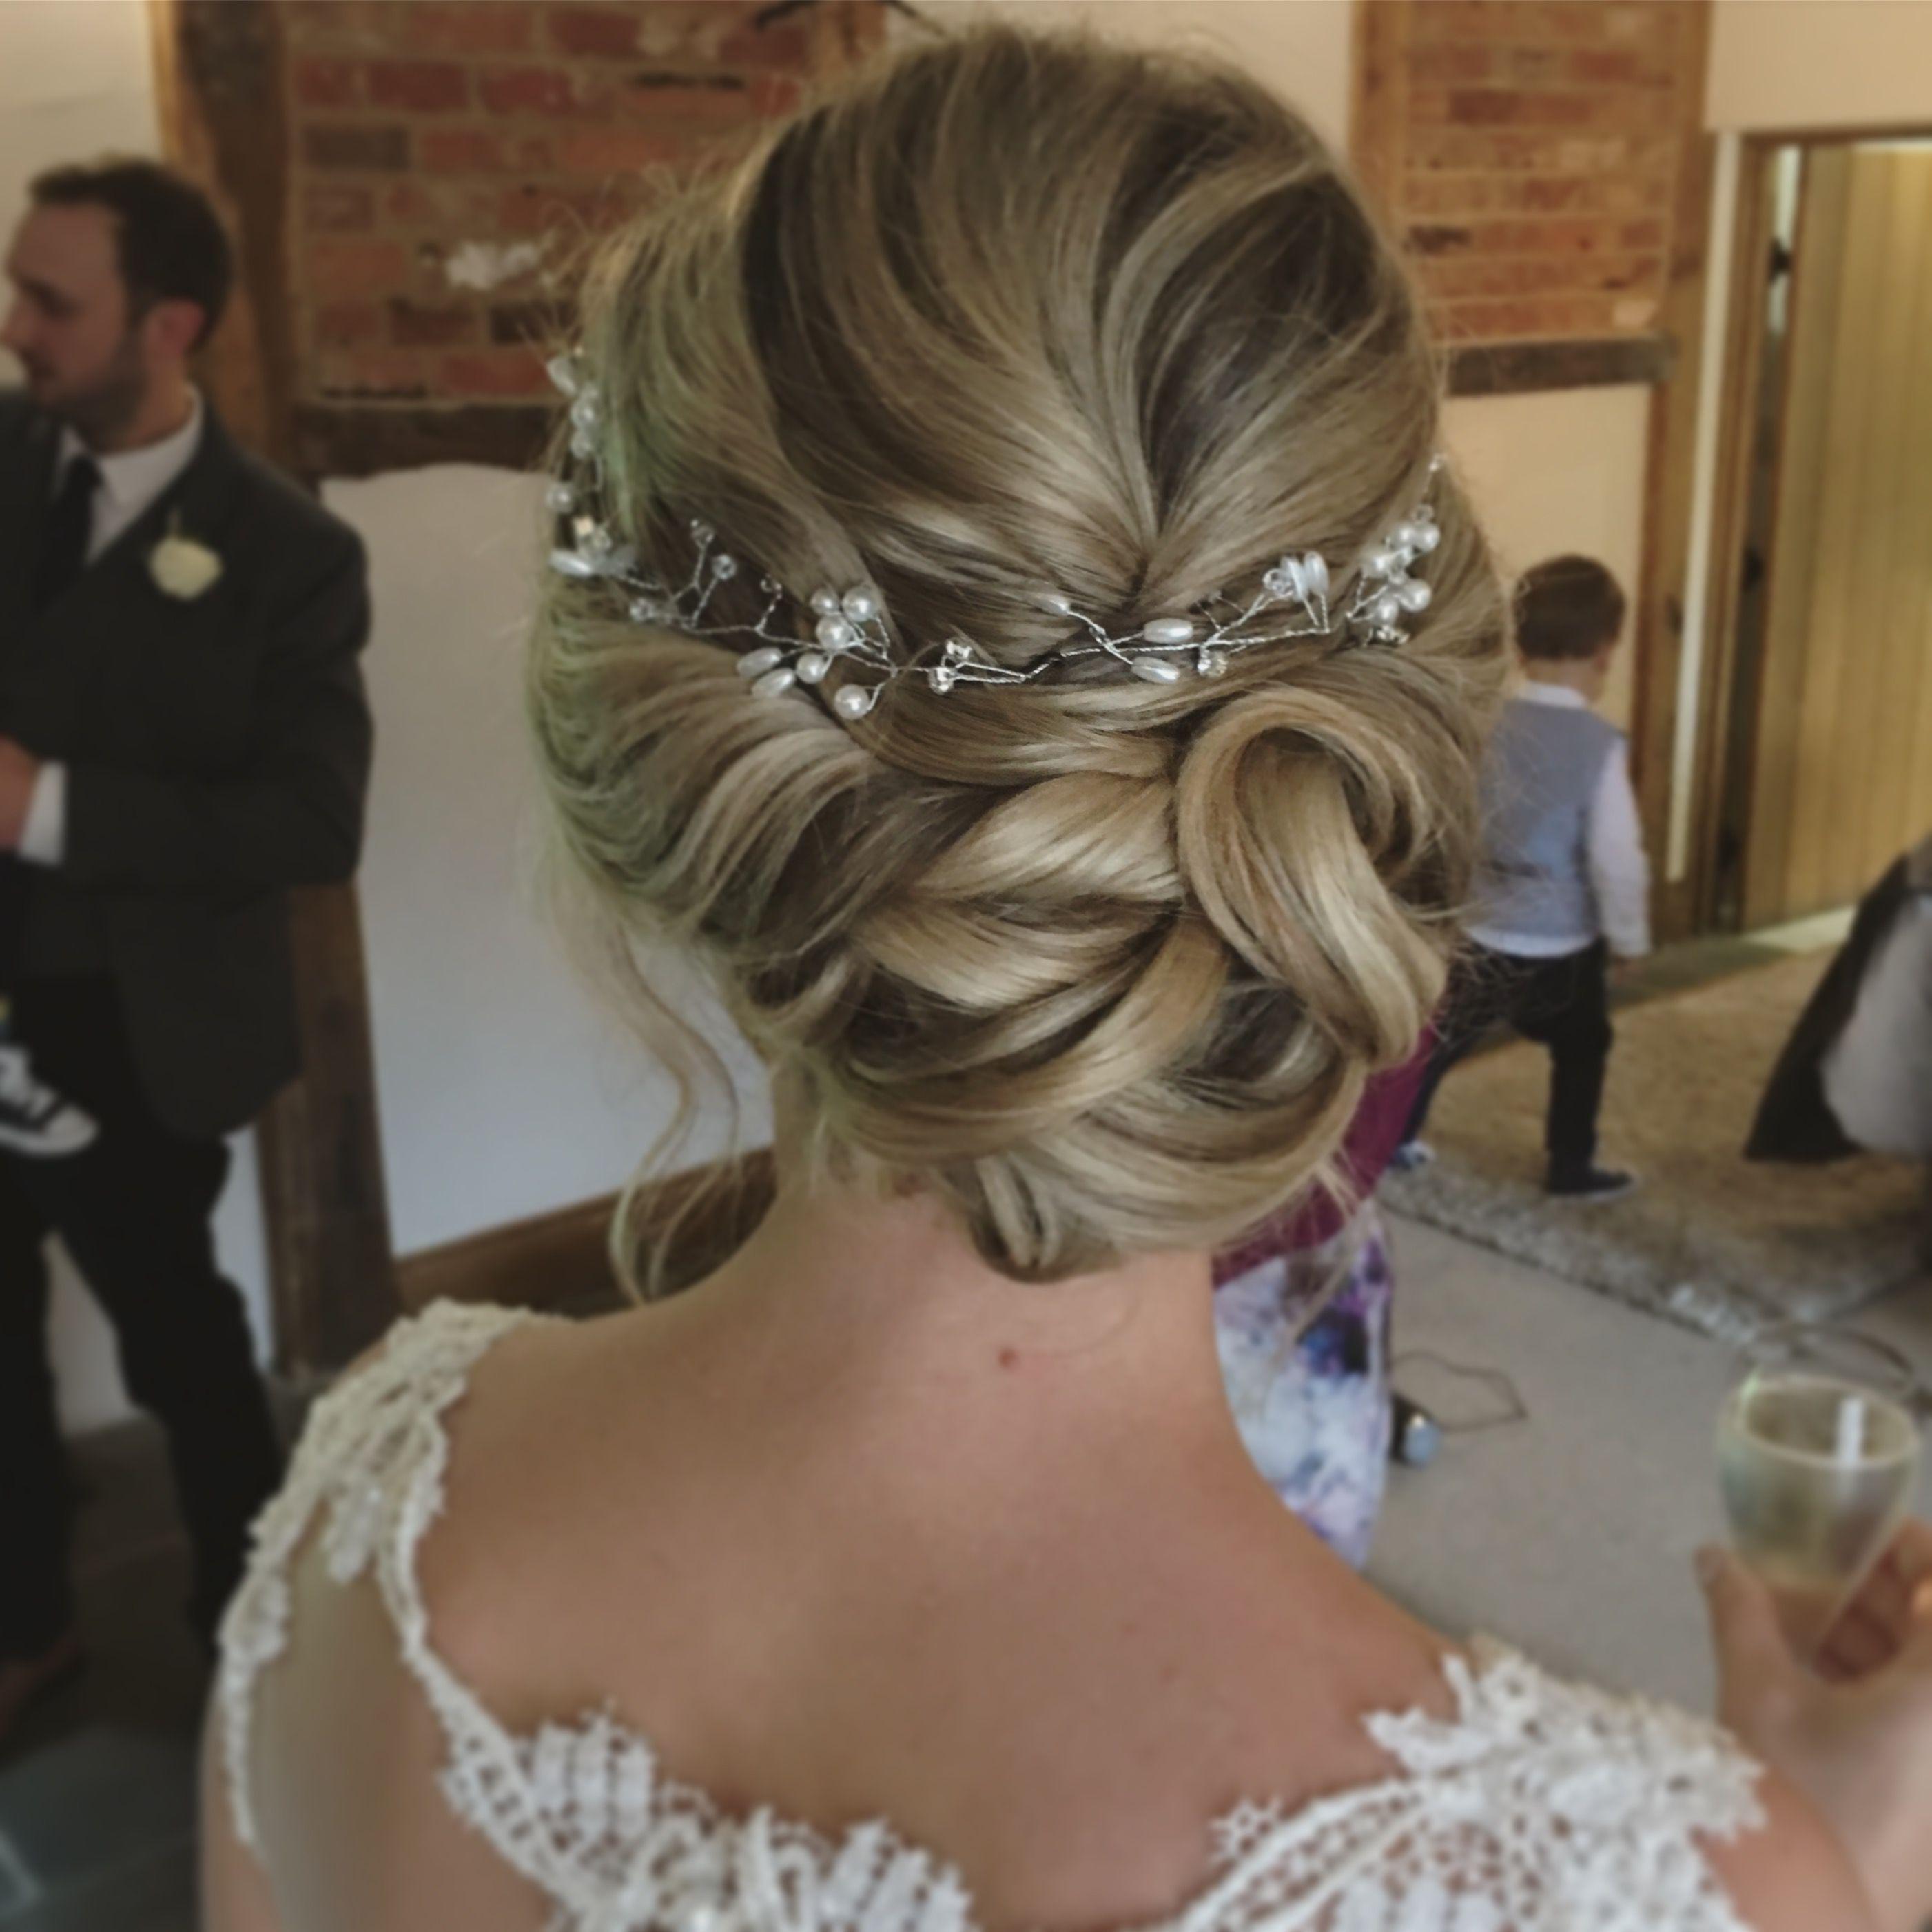 wedding hair up | wedding hair & makeup in 2019 | wedding